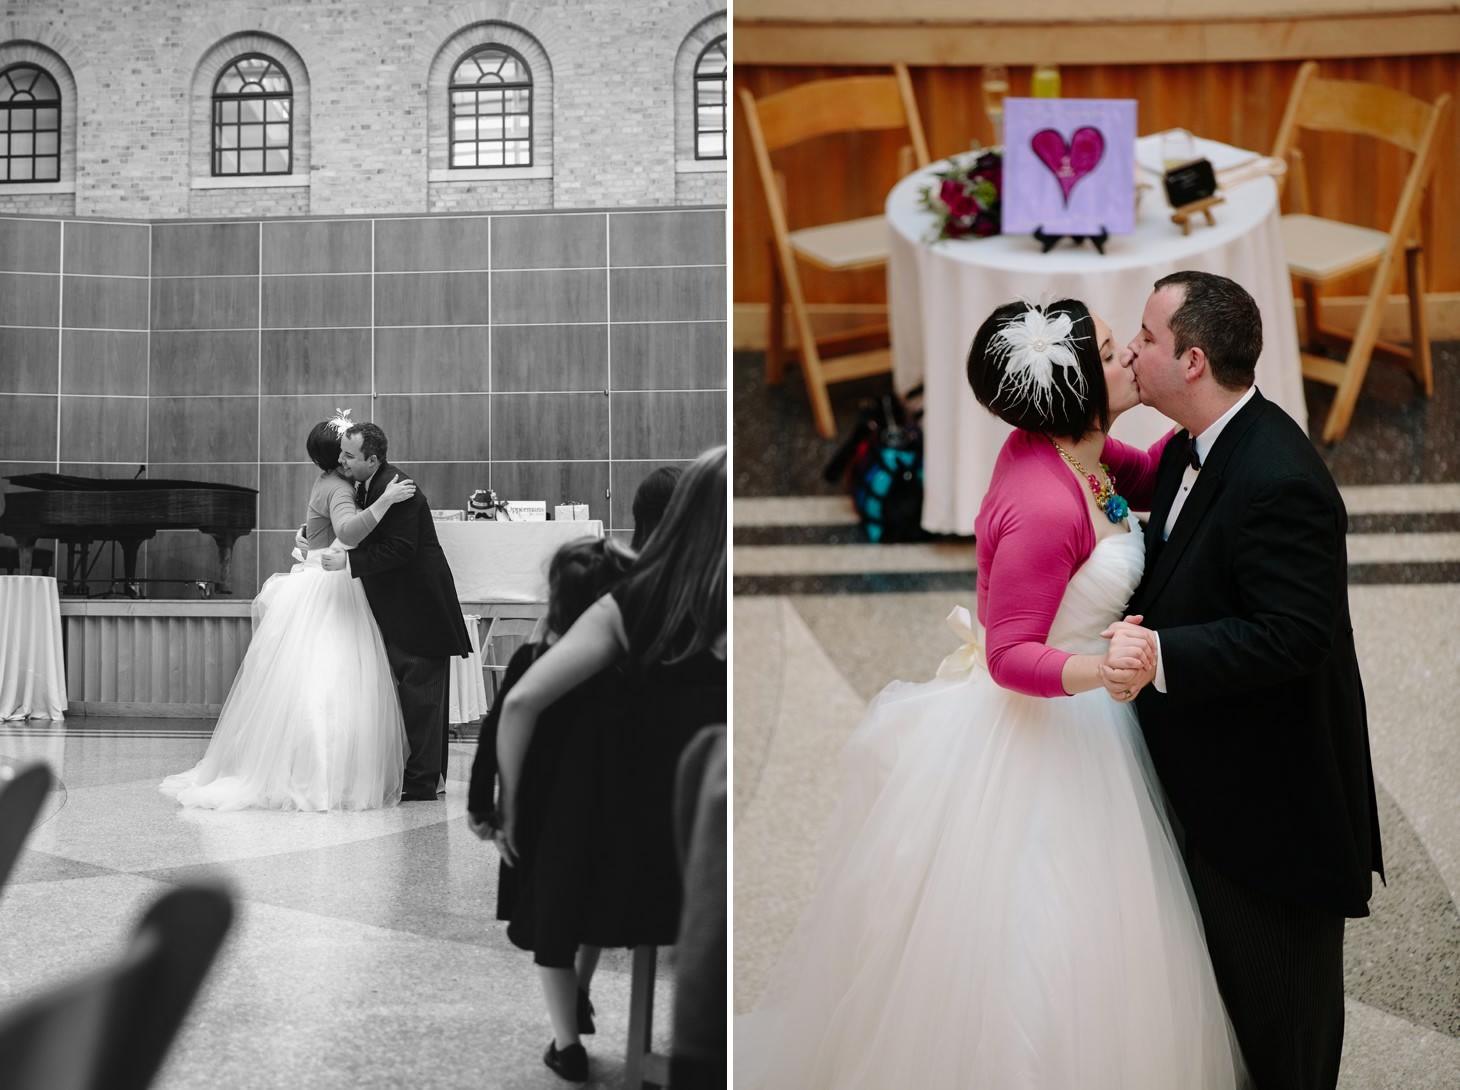 054-nyc-wedding-photographer-smitten-chickens-nj-montclair-art-museum.jpg